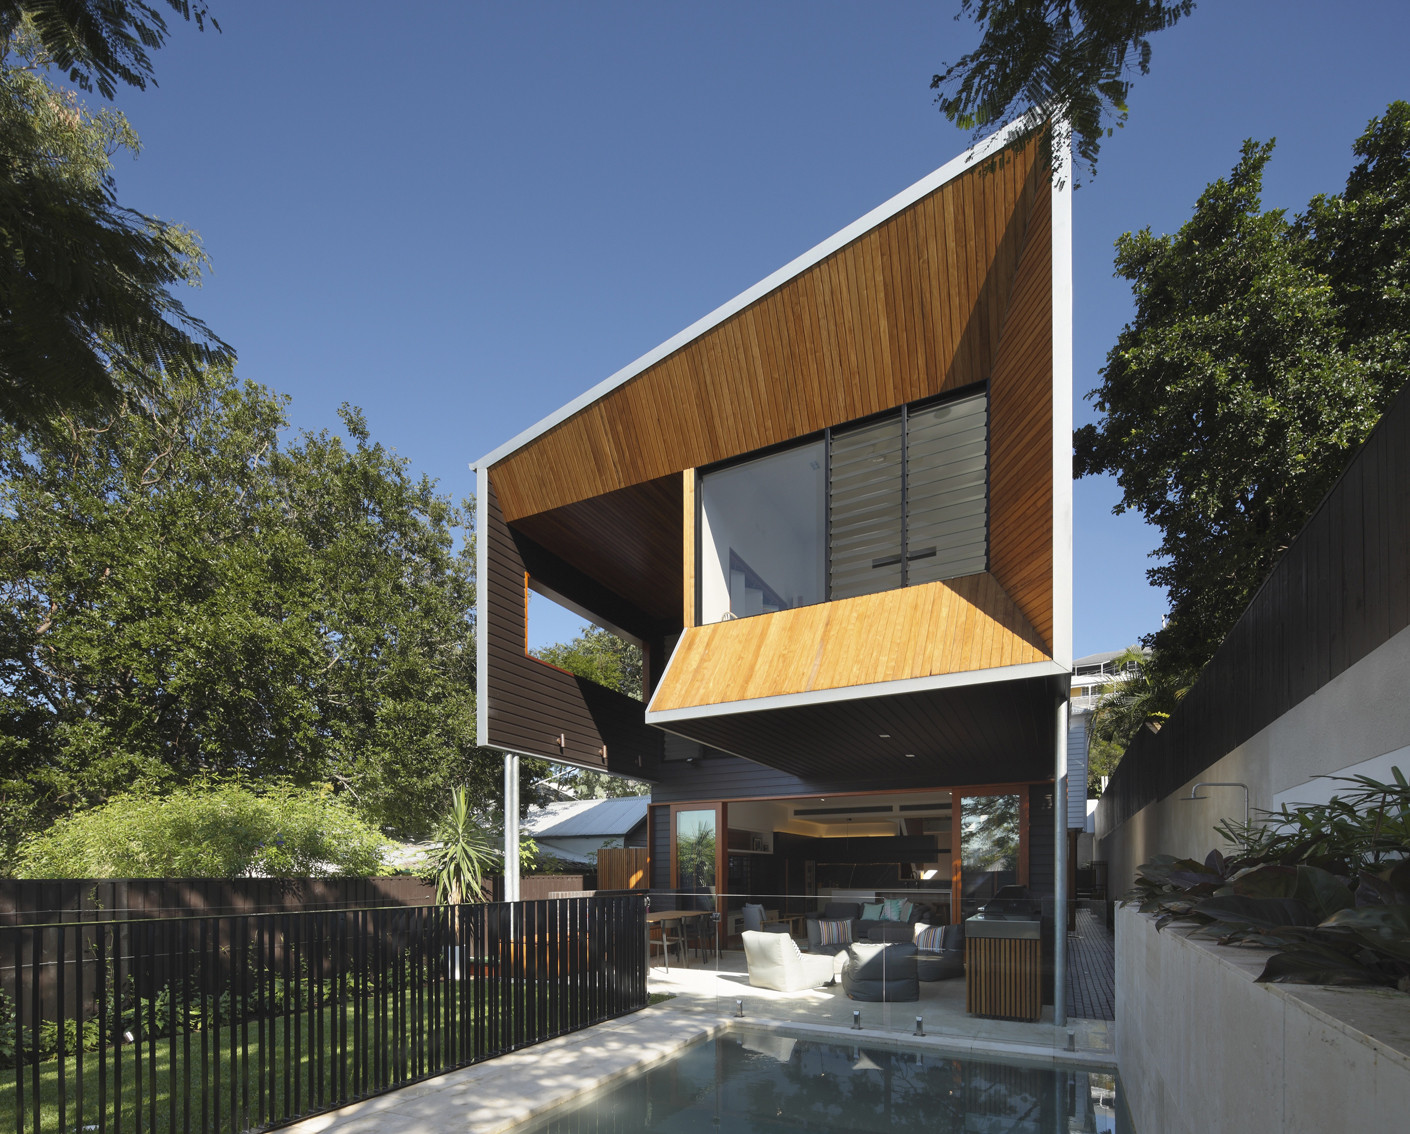 Wilden St House / Shaun Lockyer Architects, © Scott Burrows